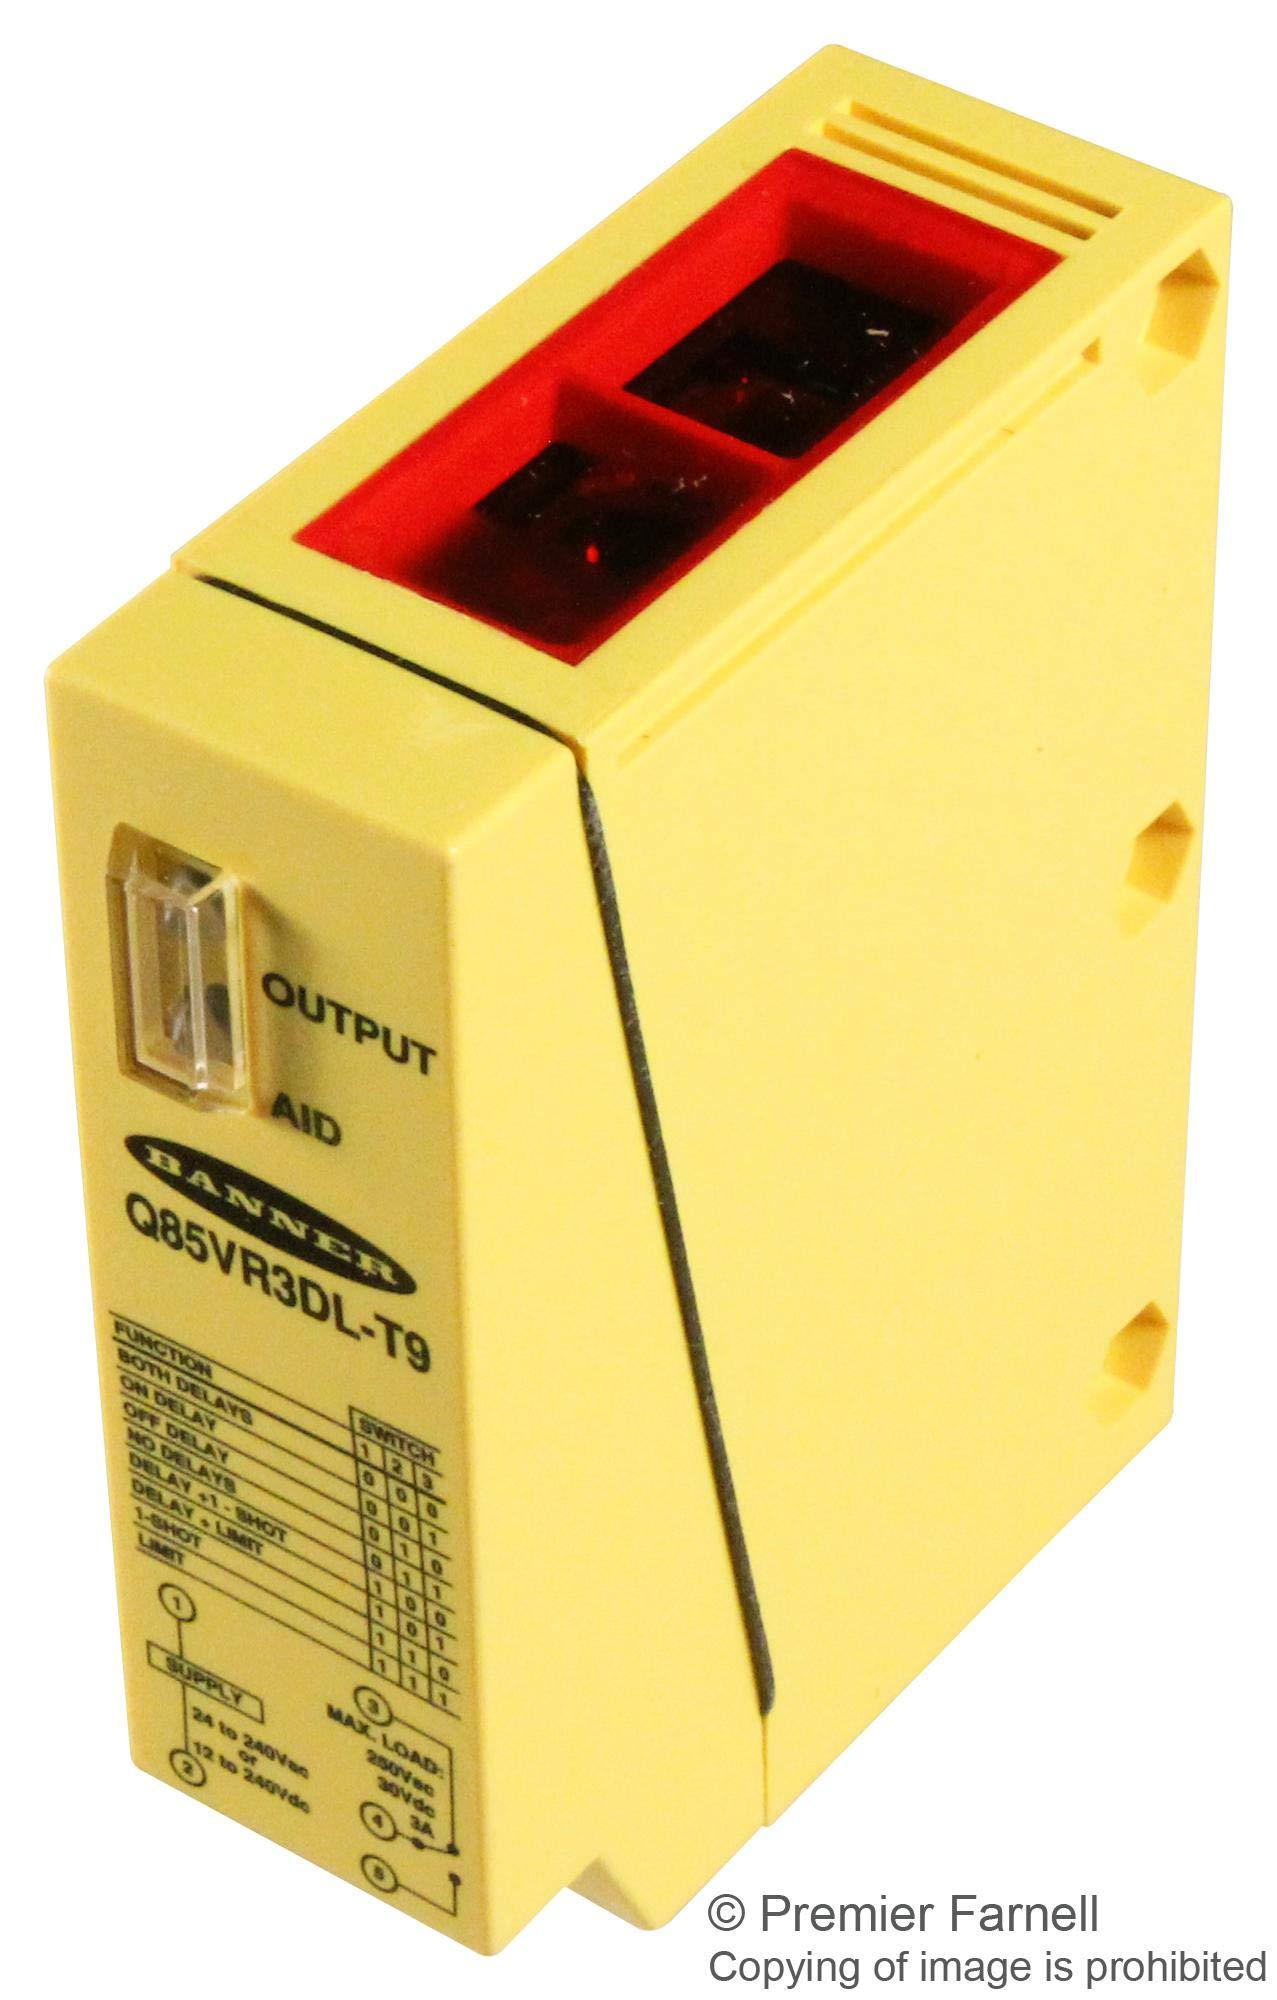 Q85VR3DL-T9 - Photoelectric Sensor, Q85 Series, Diffuse, 1 m, Relay, 12 Vdc to 240 Vdc (Q85VR3DL-T9)